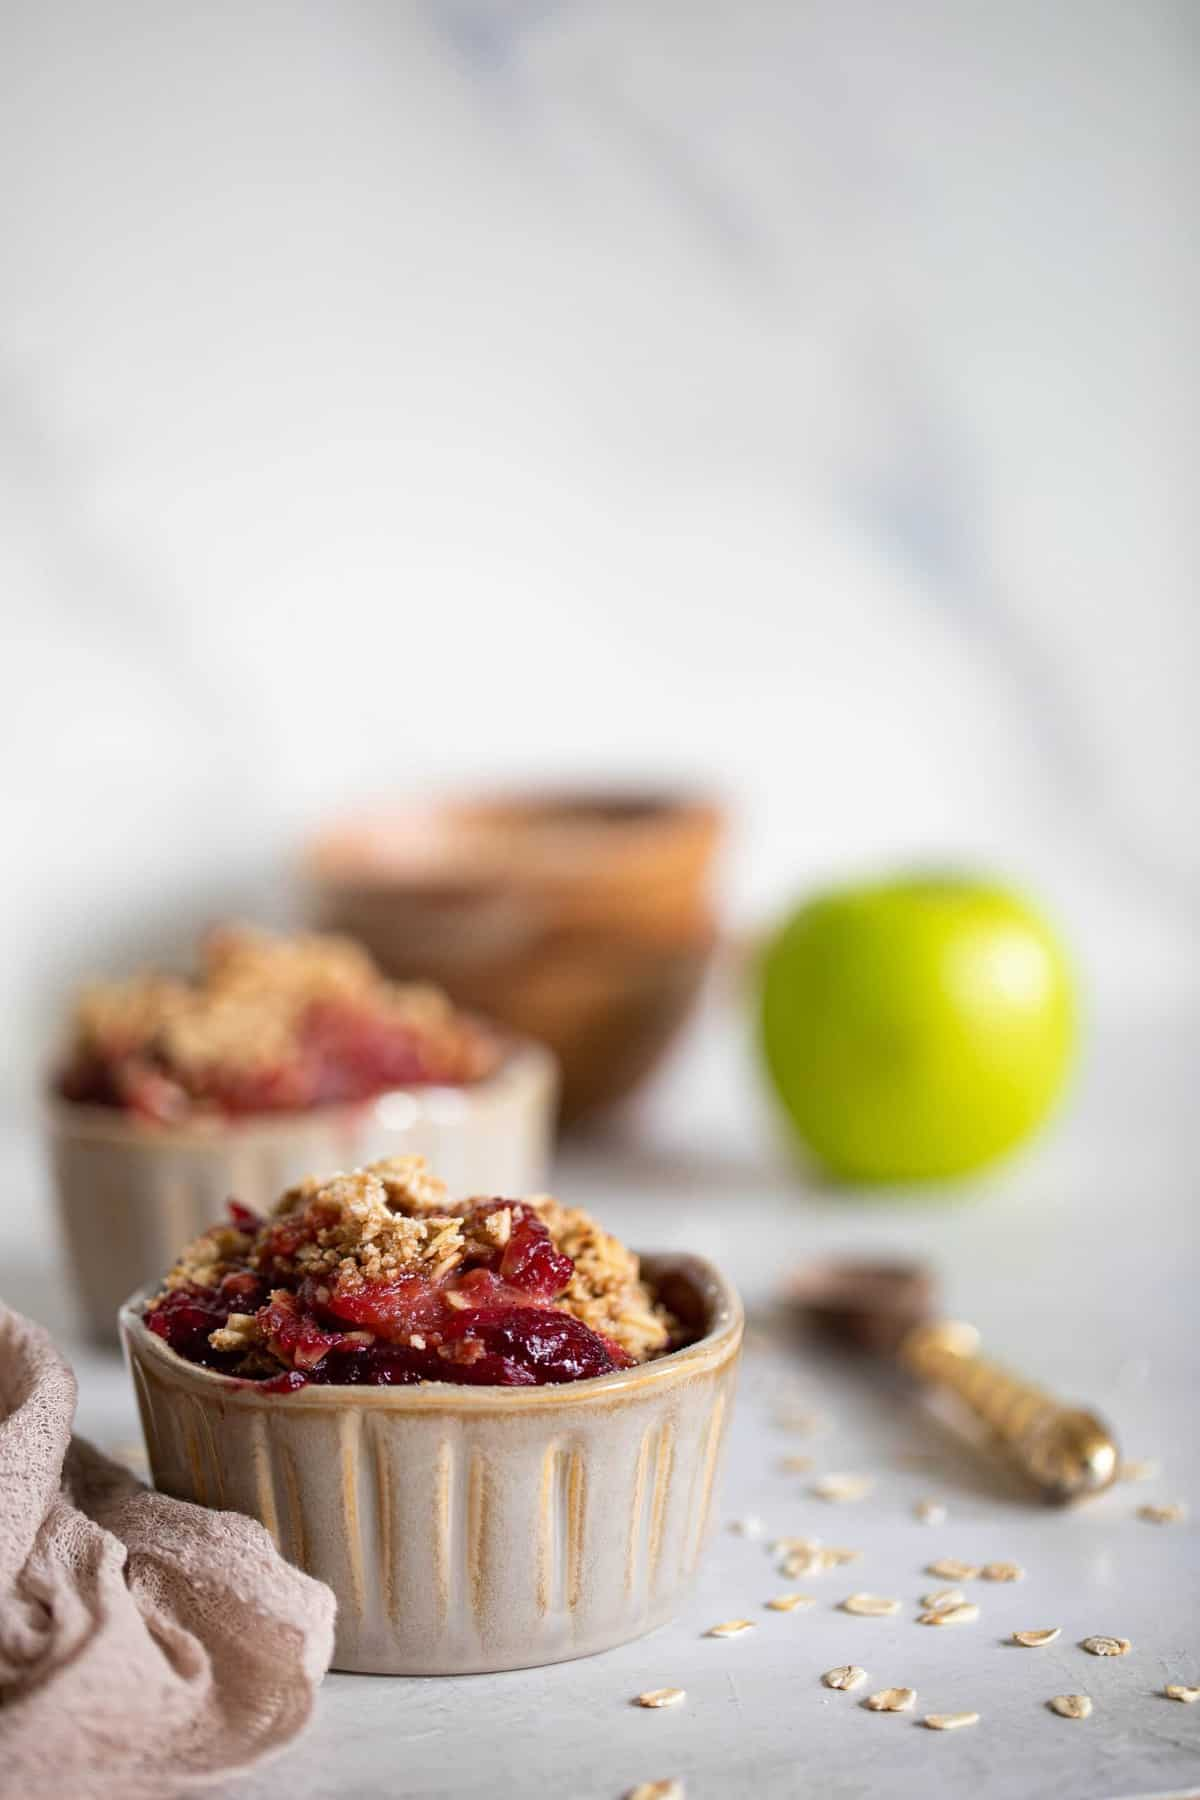 Vegan + Gluten-Free Apple Plum Crisp